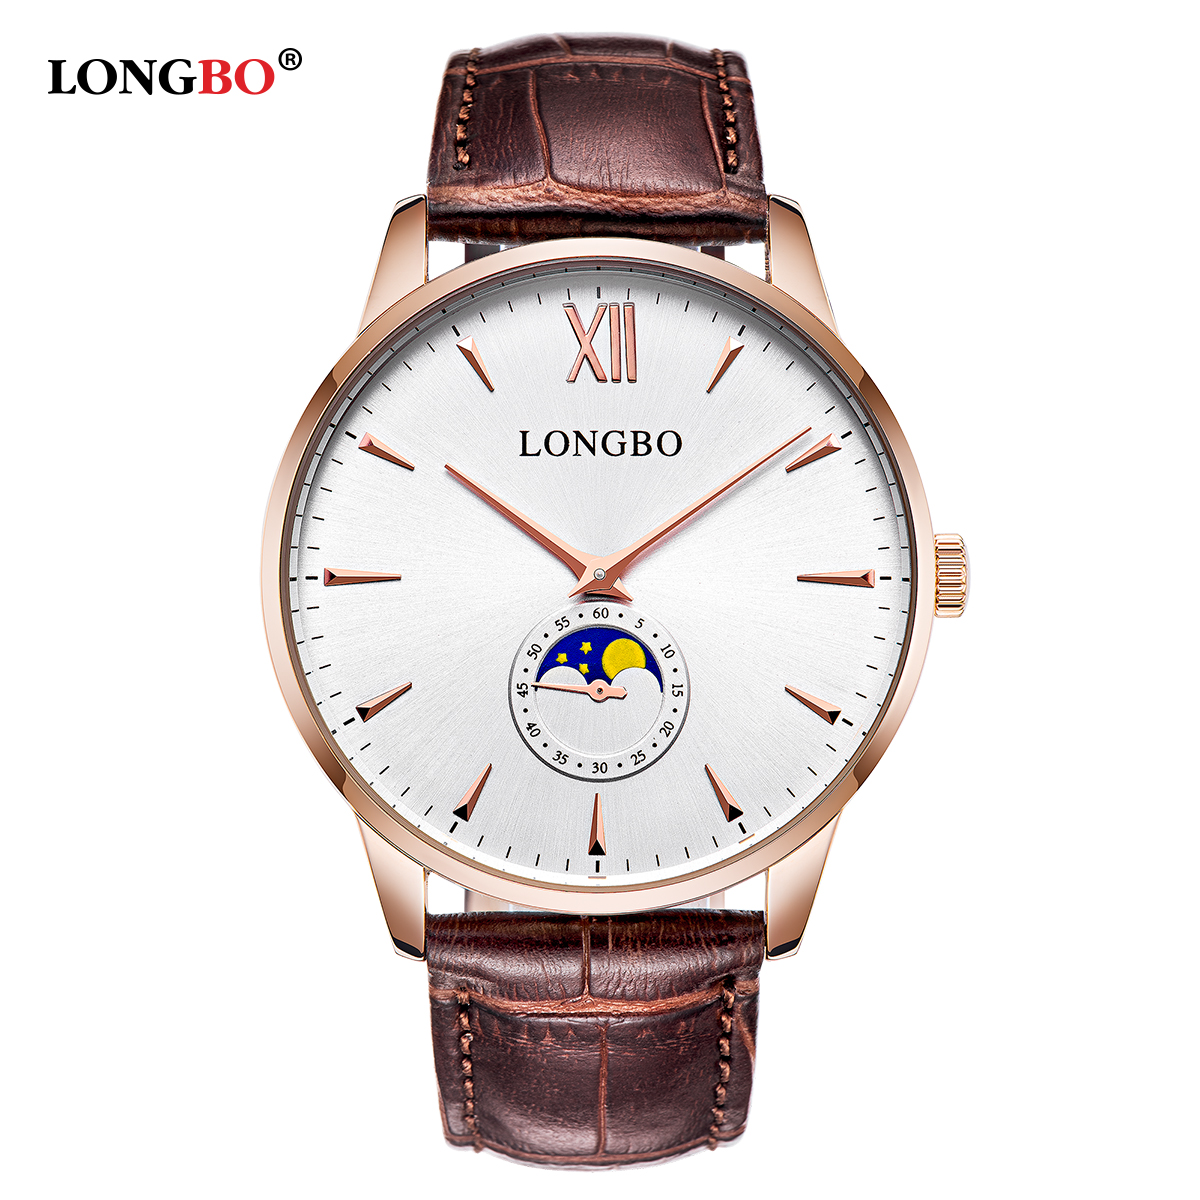 2018 Longbo Brand Luxury Brief Design Analog Leather Watches Couple Men Women Waterproof Quartz Fashion Wristwatch Montre Homme